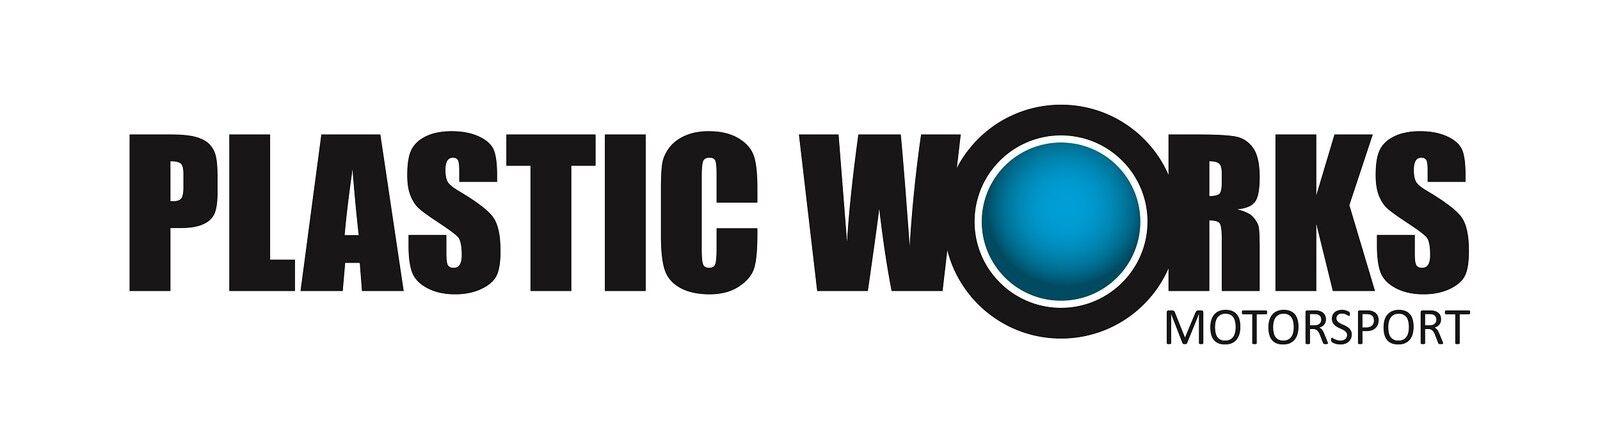 plastic_works_moto